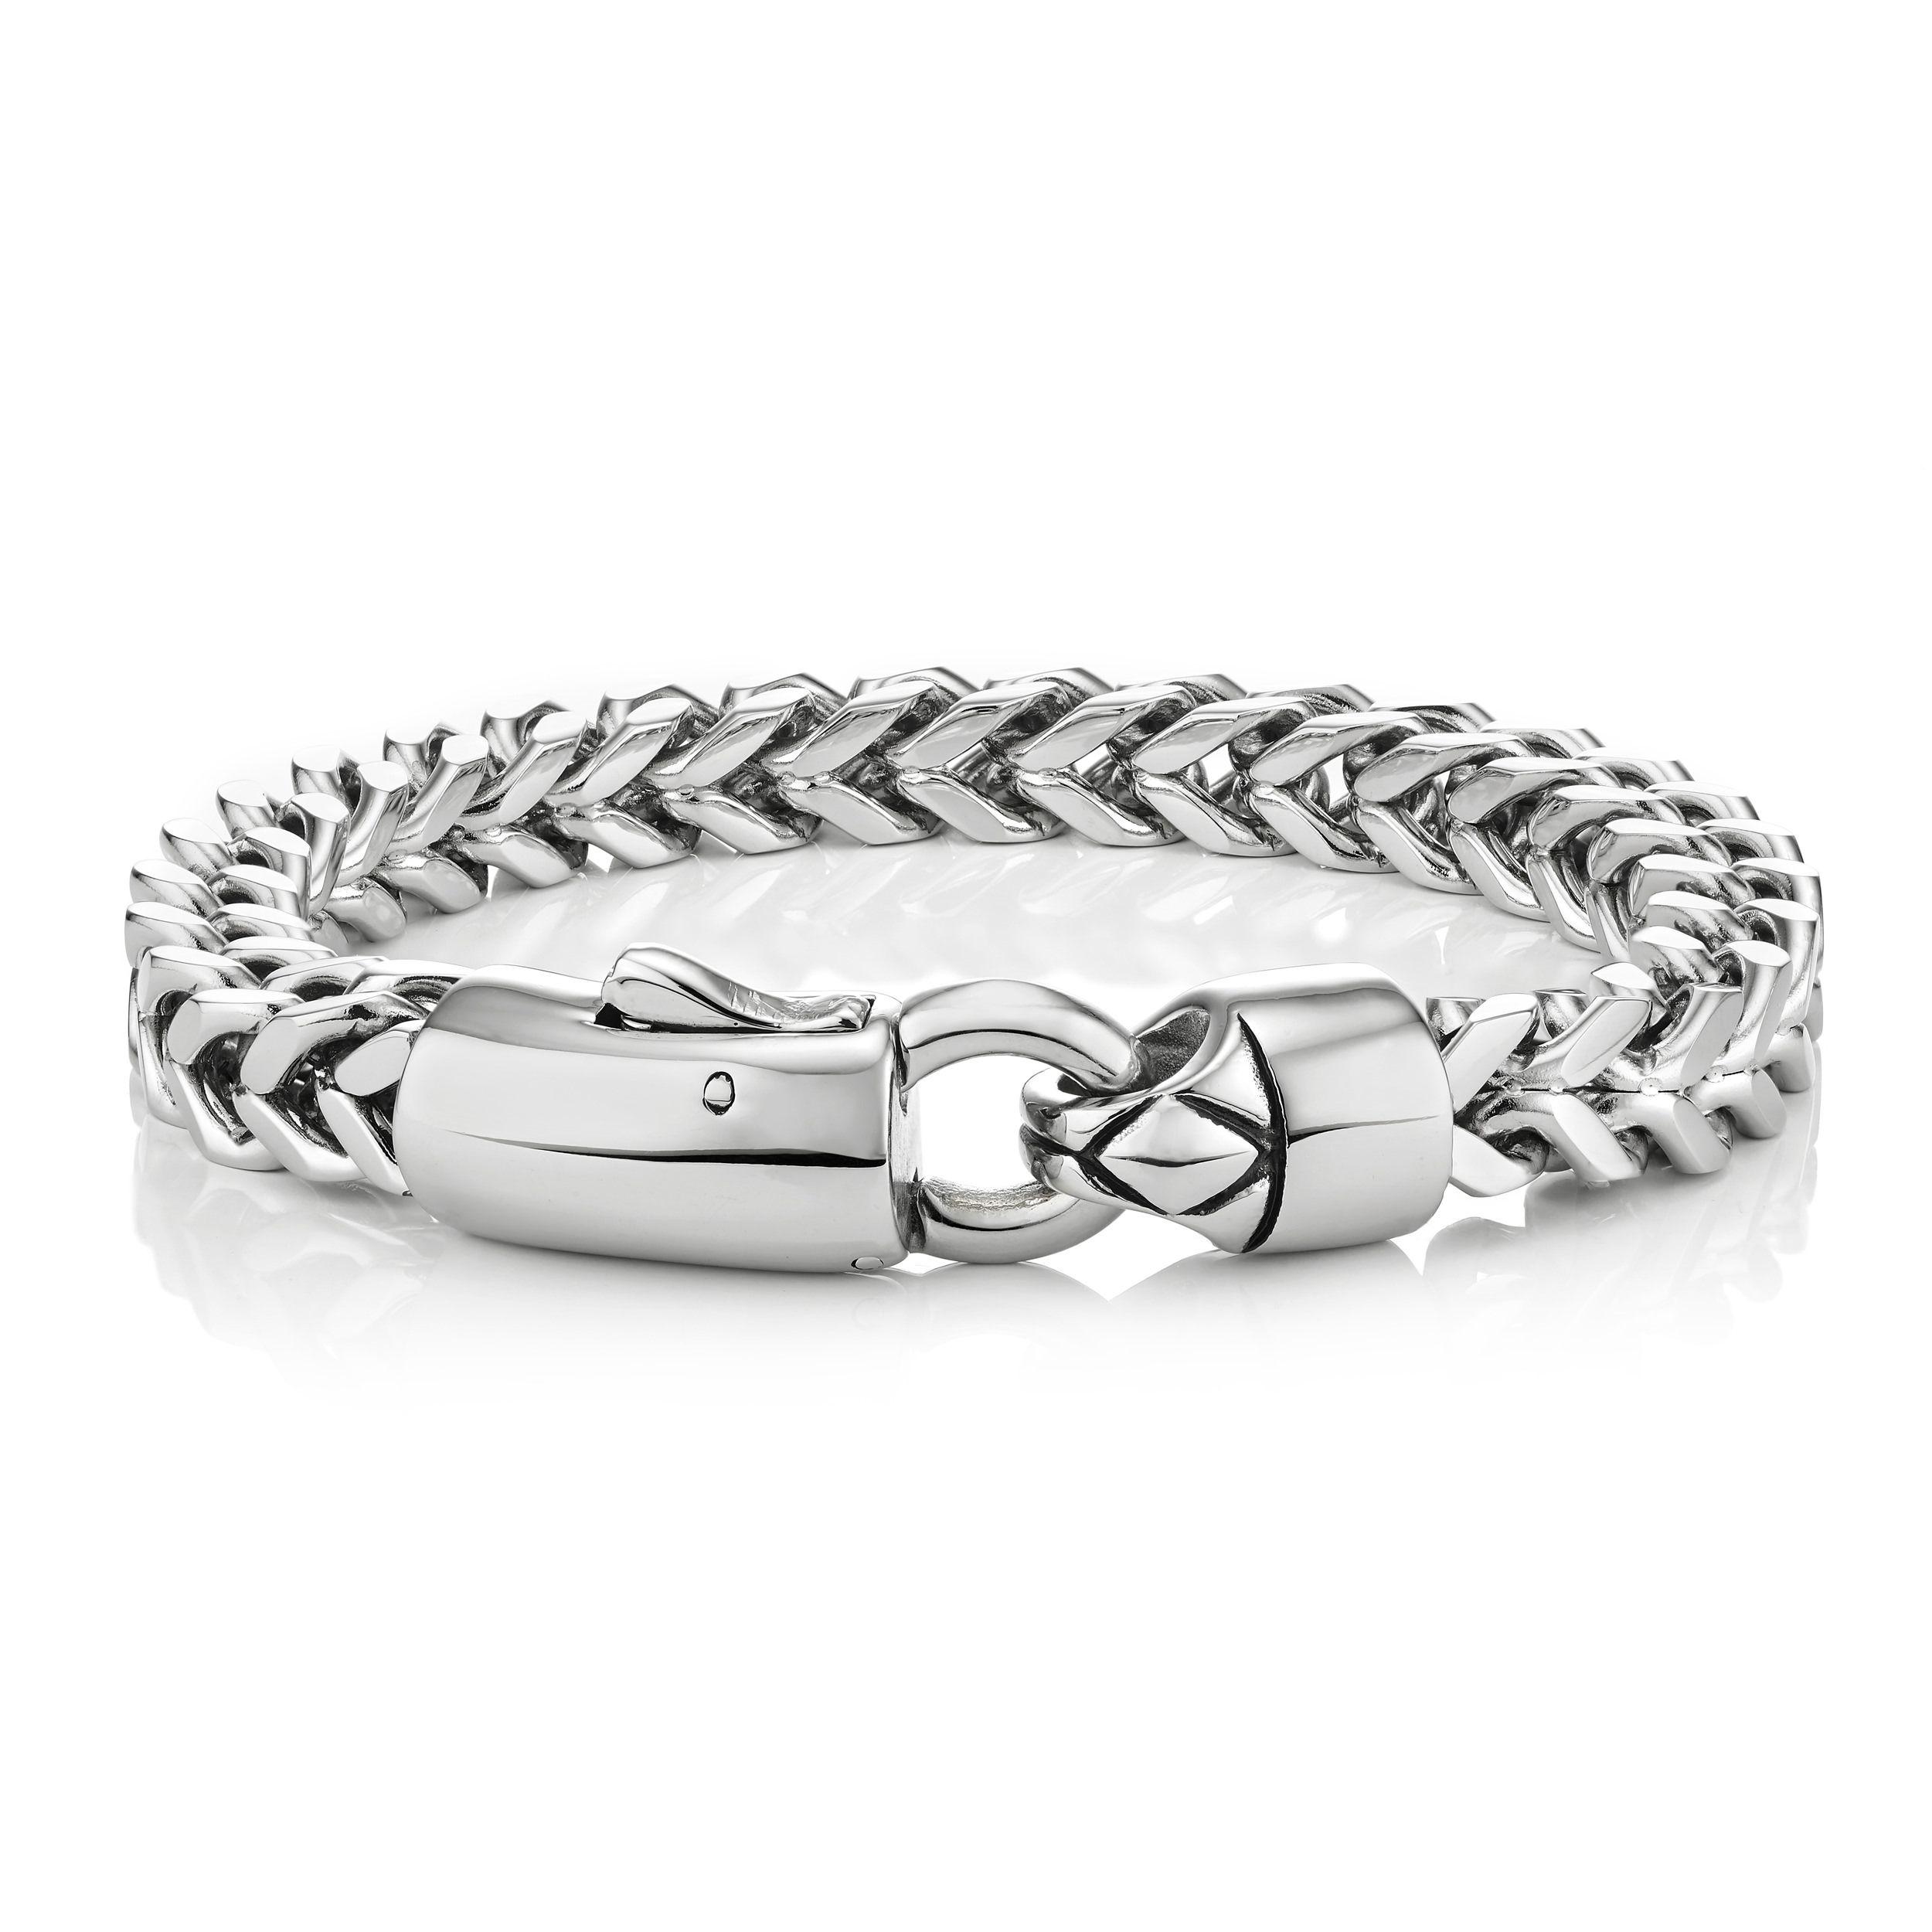 Buckley London For Him Harley Chunky Chain Bracelet